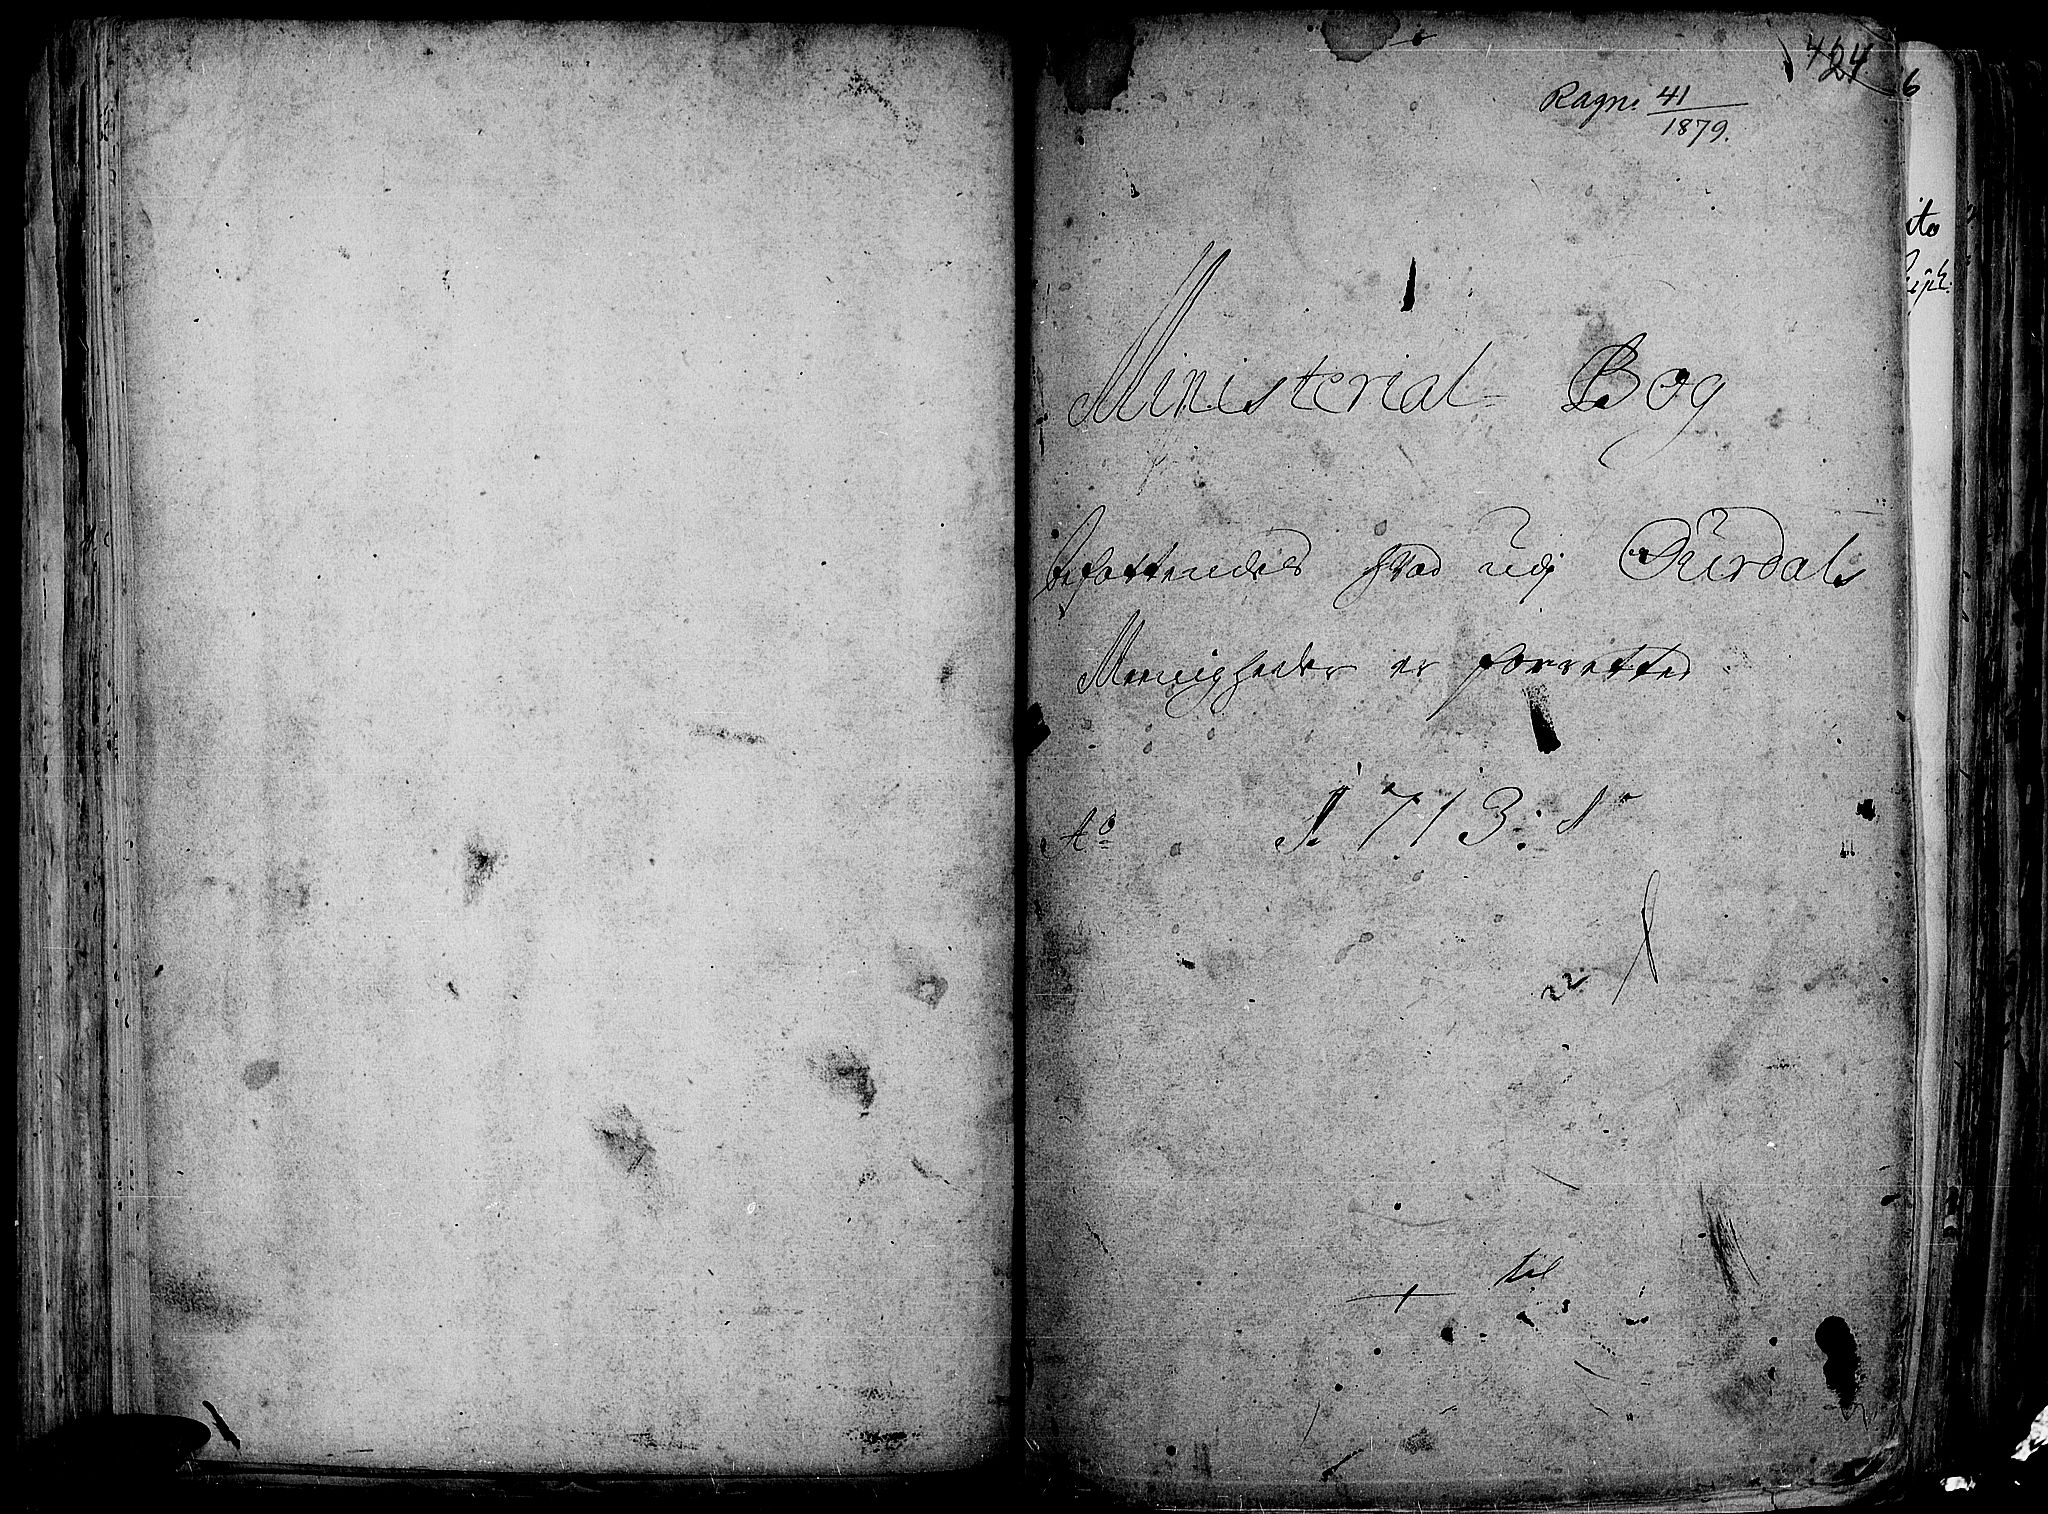 SAH, Aurdal prestekontor, Ministerialbok nr. 1-3, 1692-1730, s. 424